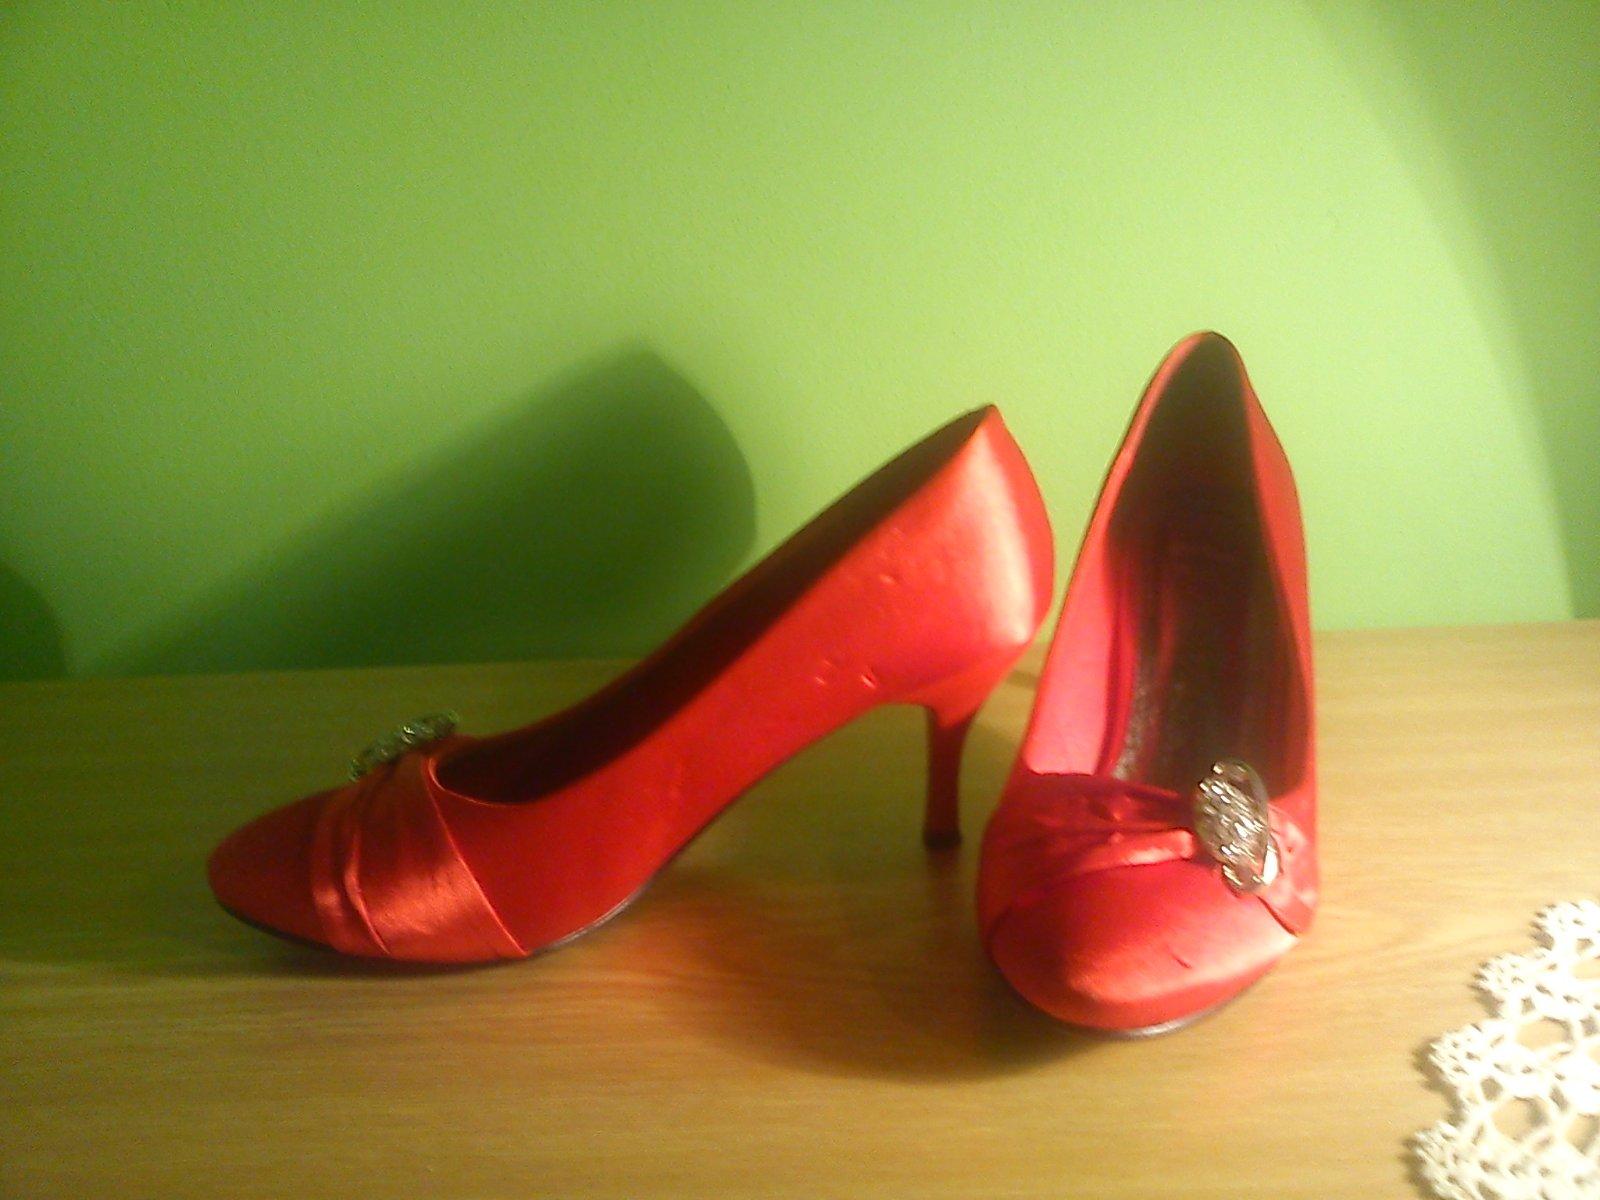 cervene satenove topanky - Obrázok č. 1